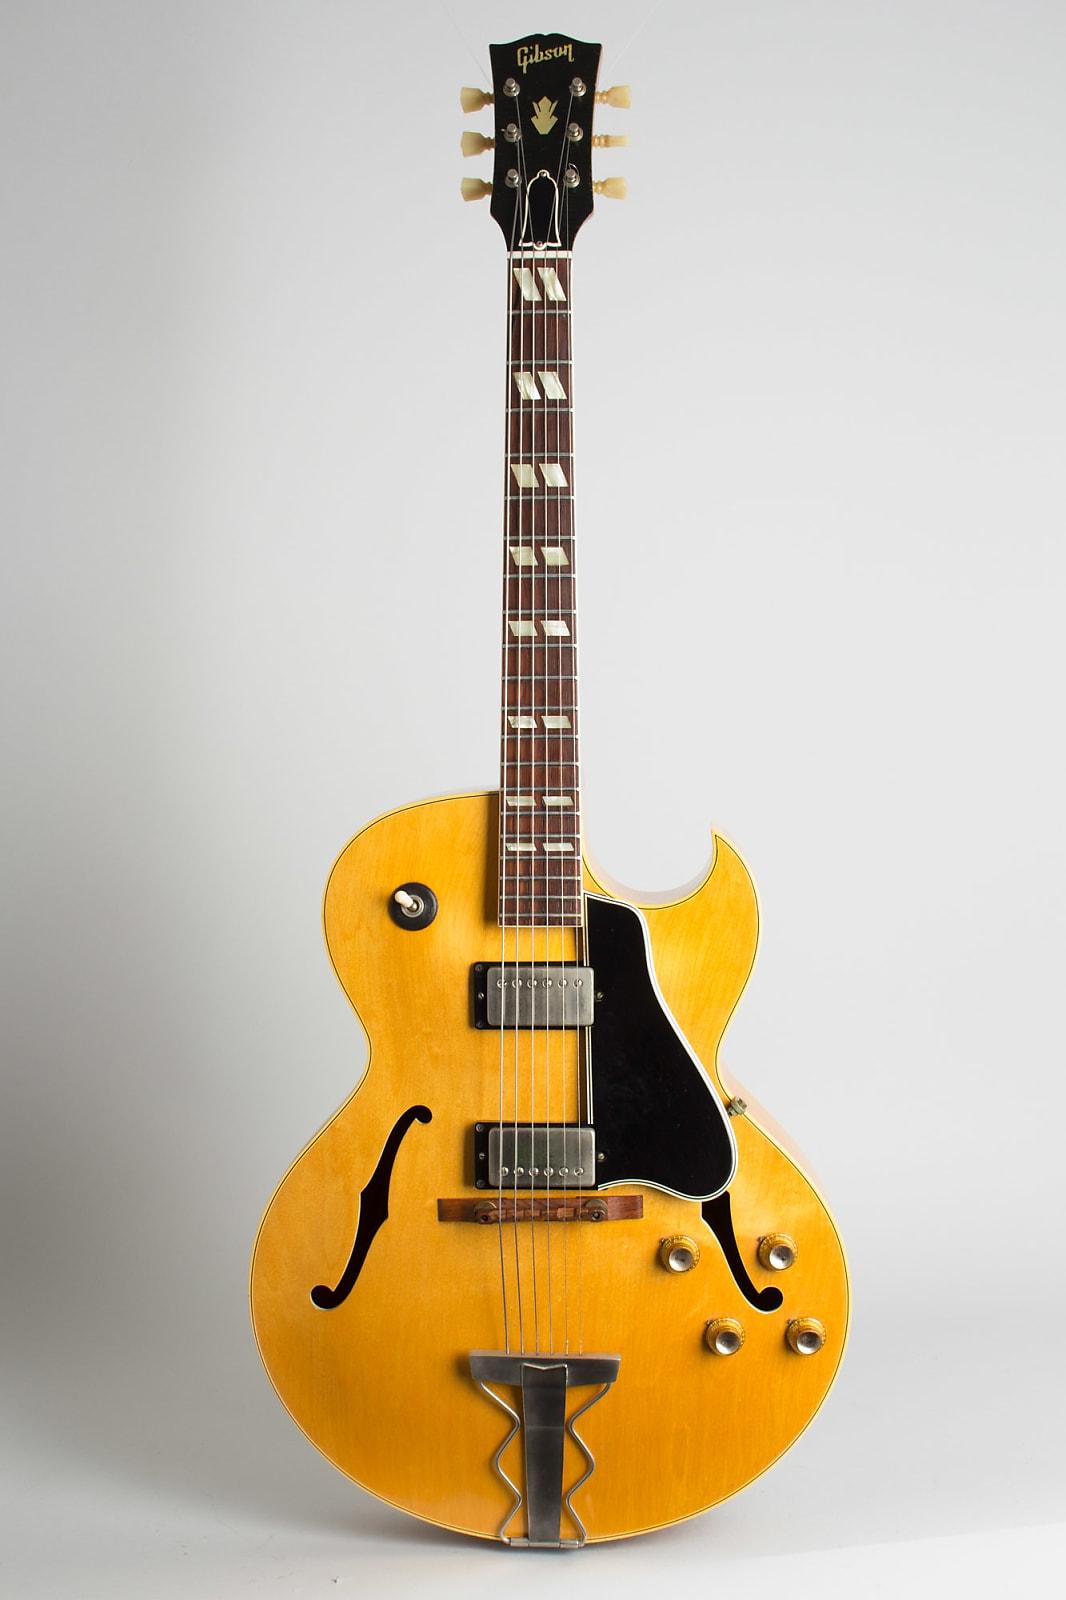 Gibson  ES-175DN Arch Top Hollow Body Electric Guitar (1962), ser. #89335, original black tolex hard shell case.